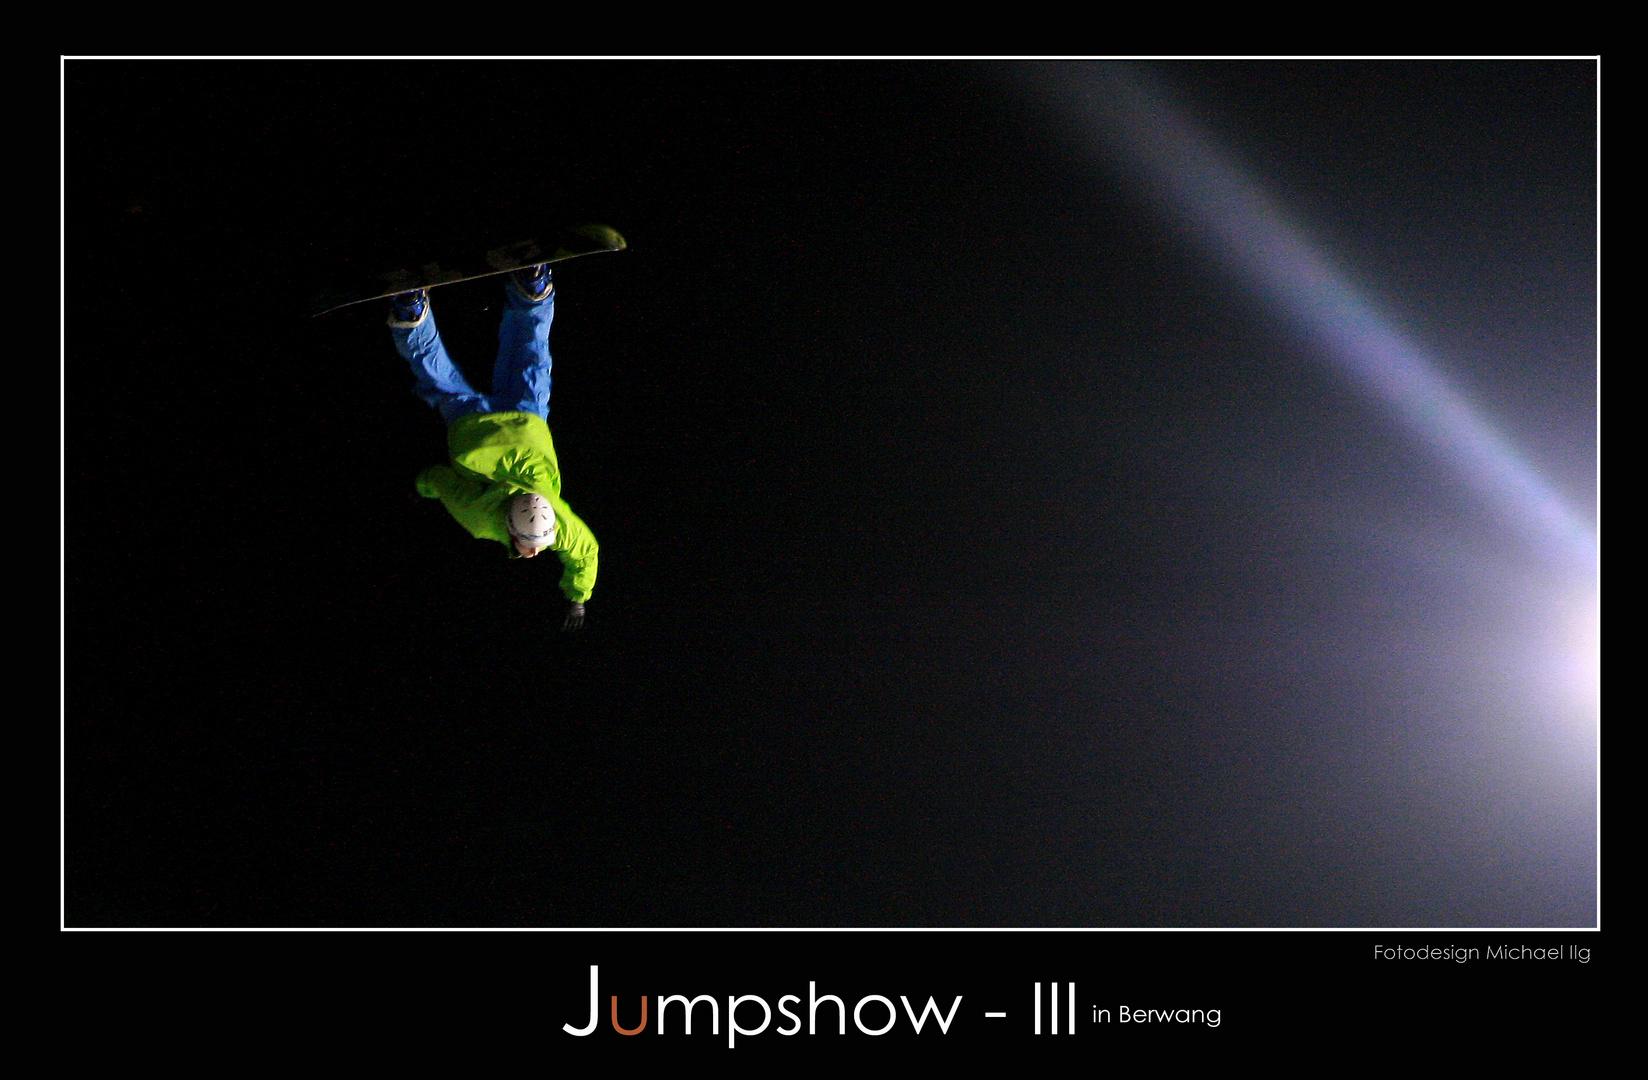 Jumpshow III - Berwang